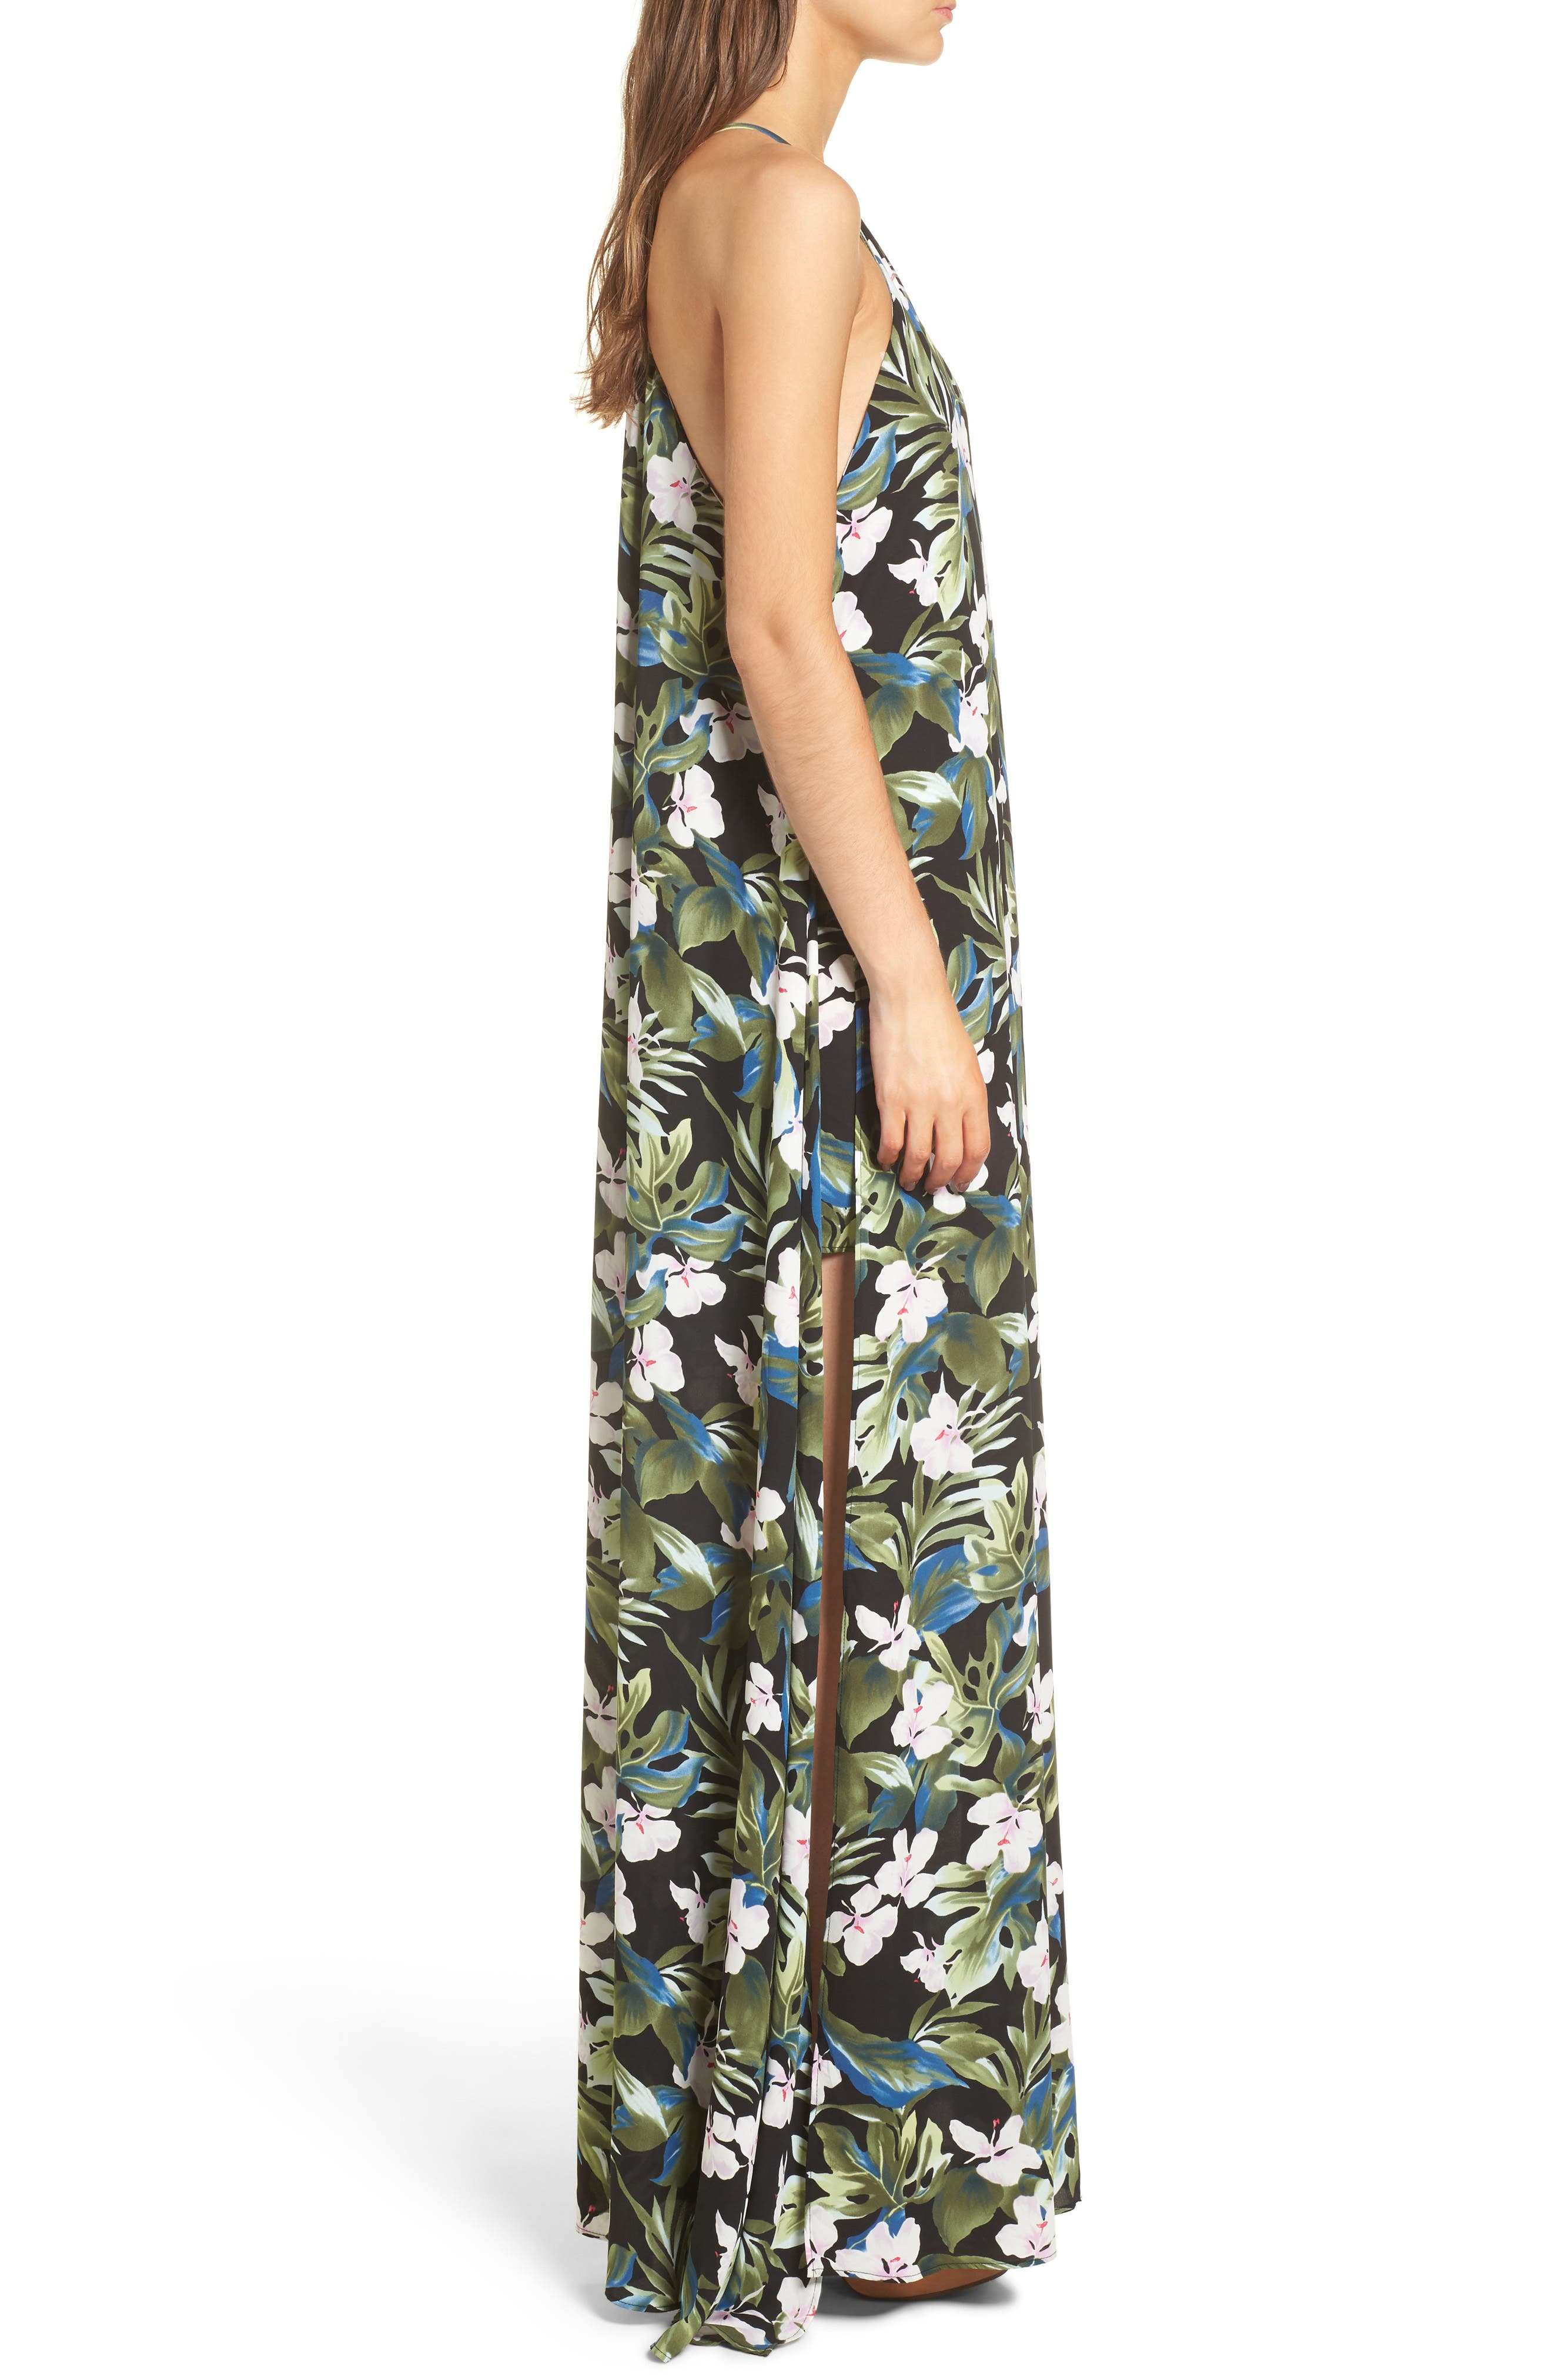 Bronte Maxi Dress,                             Alternate thumbnail 3, color,                             Monet On Vacay